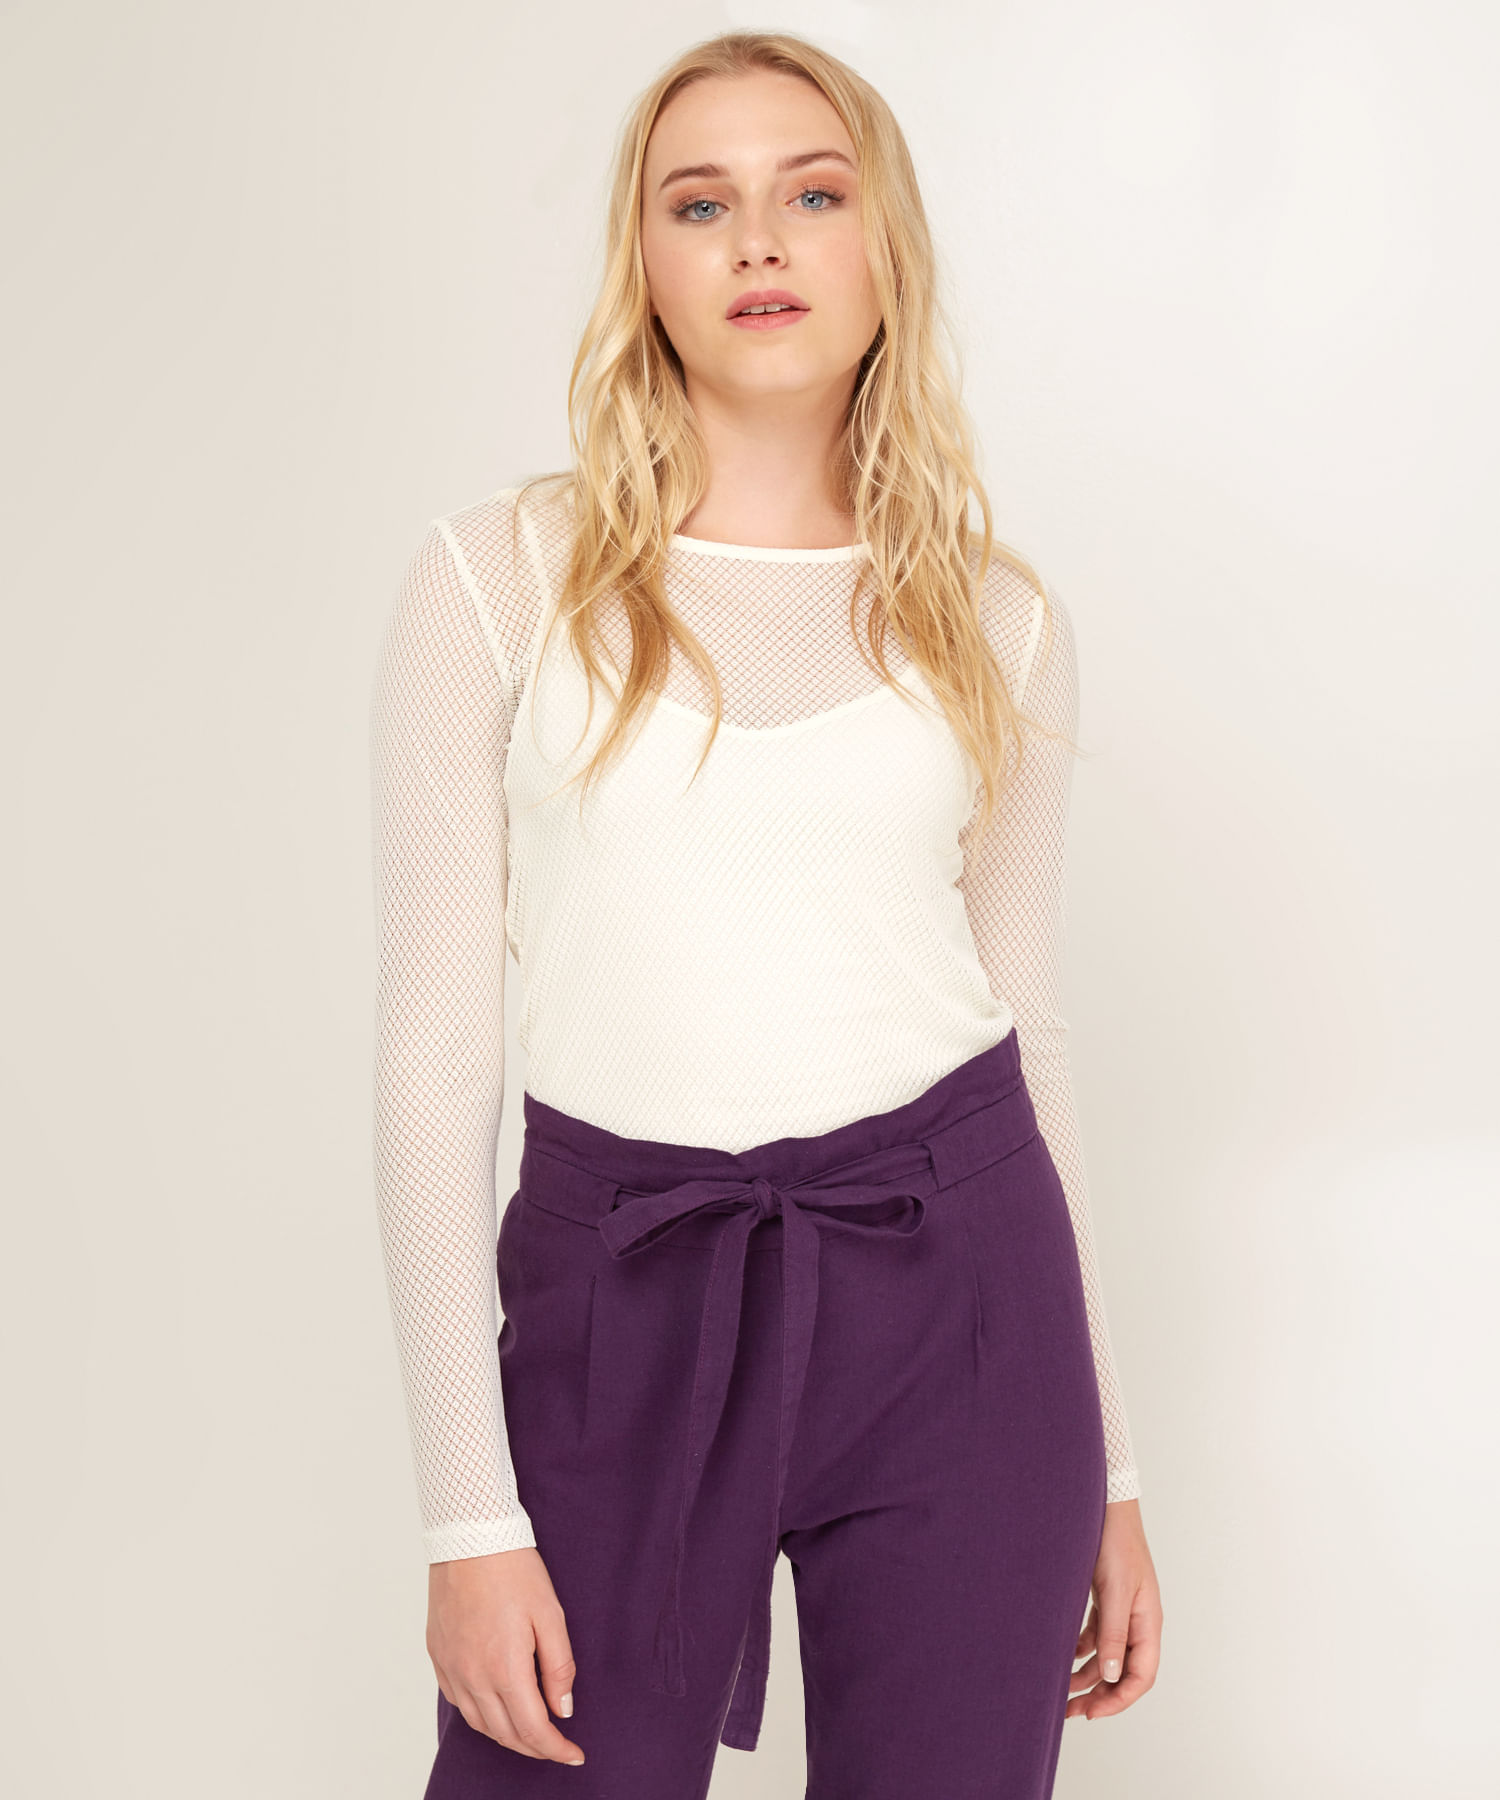 Camiseta unicolor para mujer en encaje manga larga color blanco jpg  1500x1800 Unicolor camisetas para mujer b646a9eb4aff2